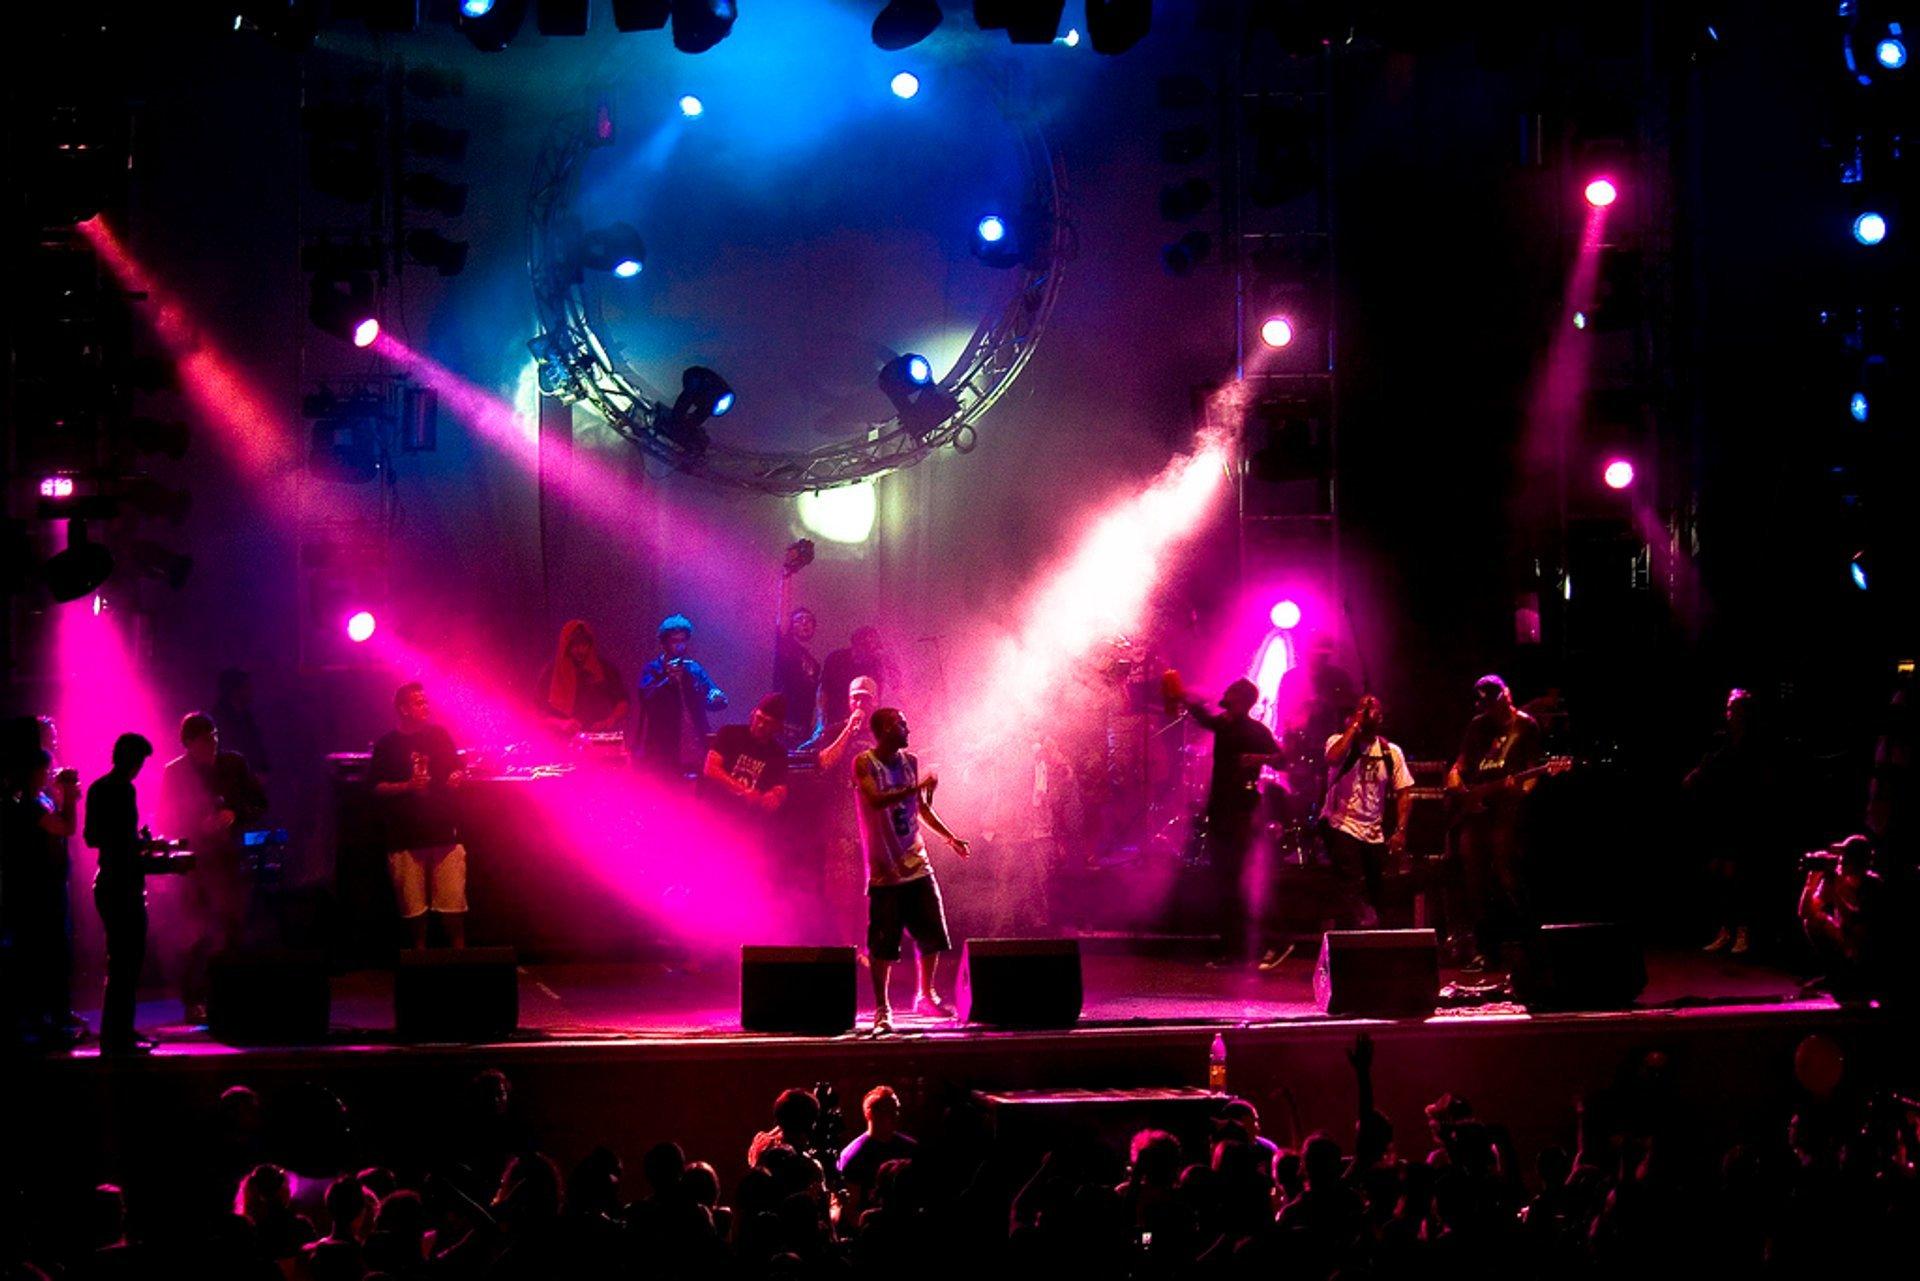 Donauinselfest (Danube Island Festival) in Vienna - Best Season 2020